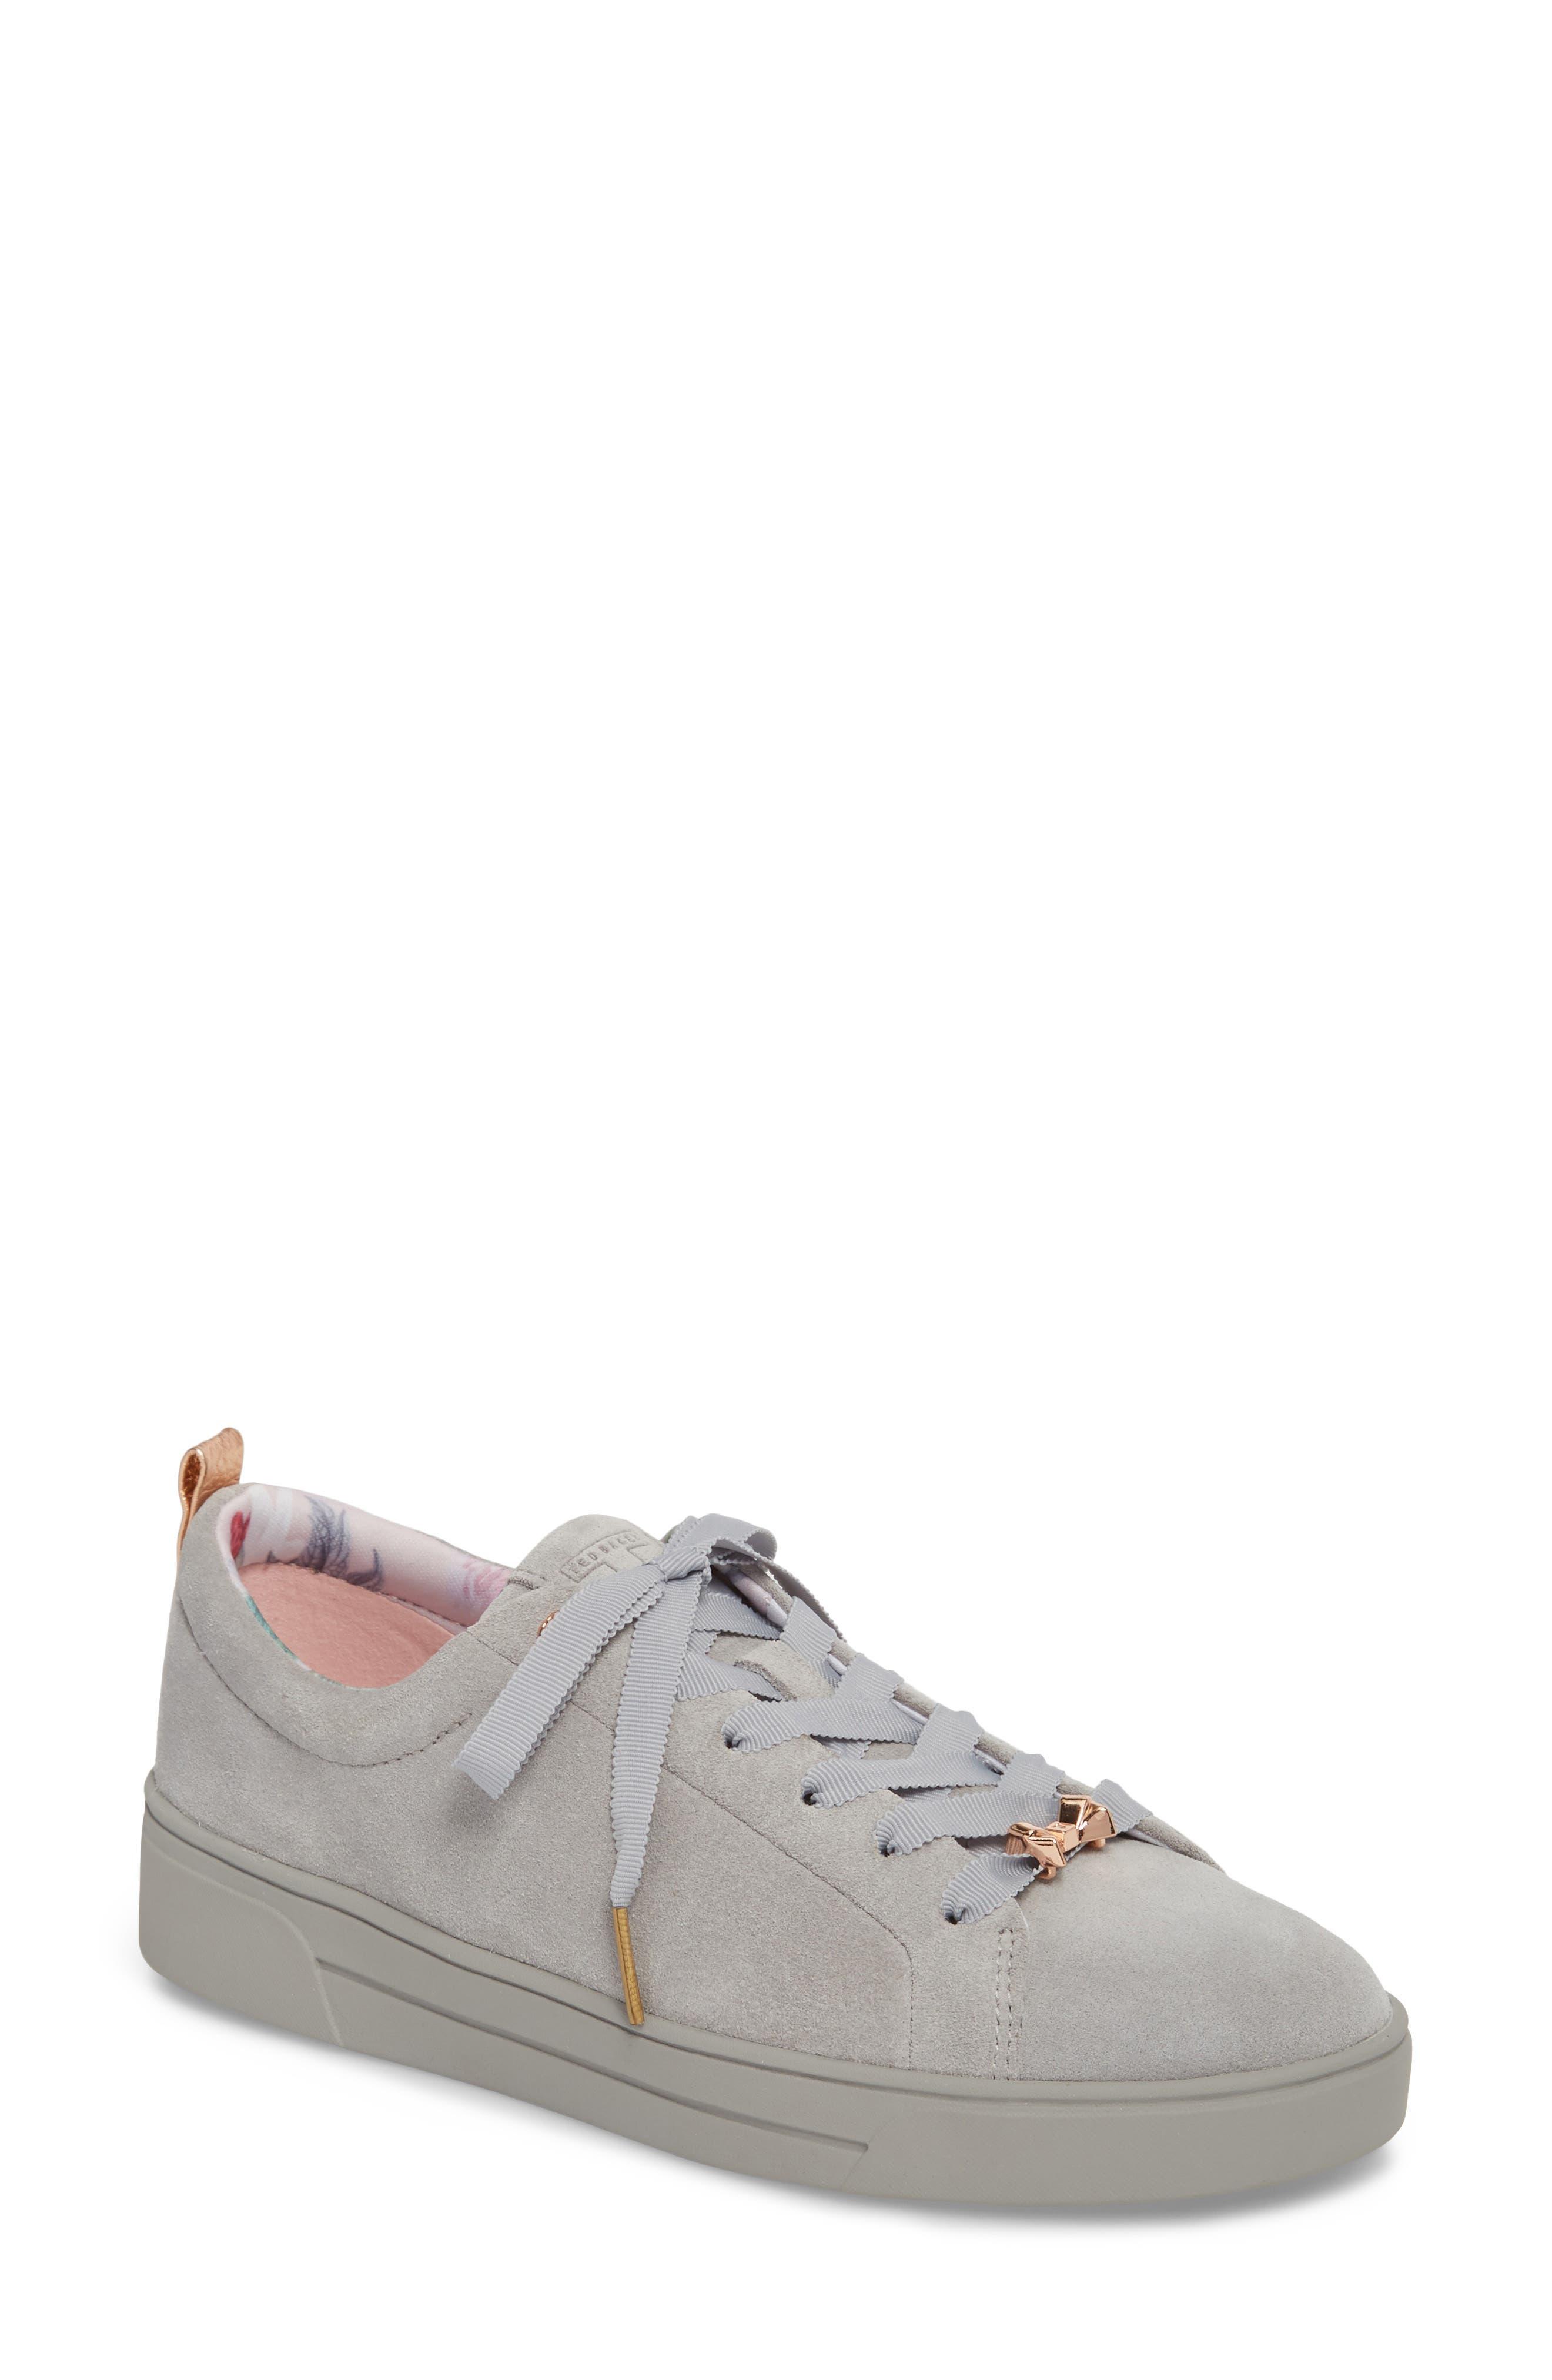 Kelleis Sneaker,                             Main thumbnail 1, color,                             LIGHT GREY SUEDE